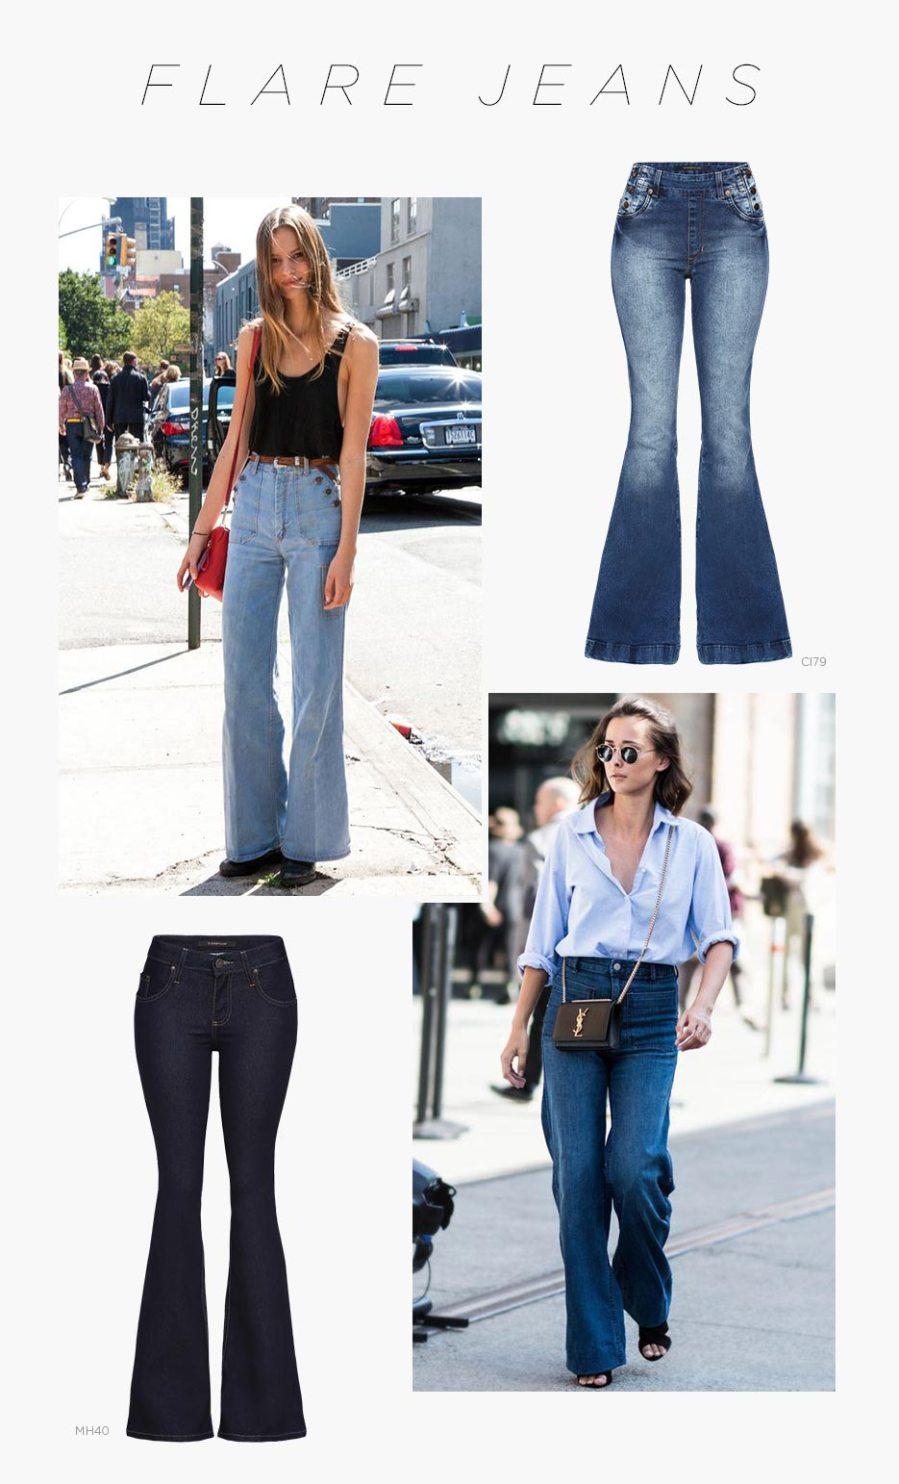 calça flare jeans estilo anos 70